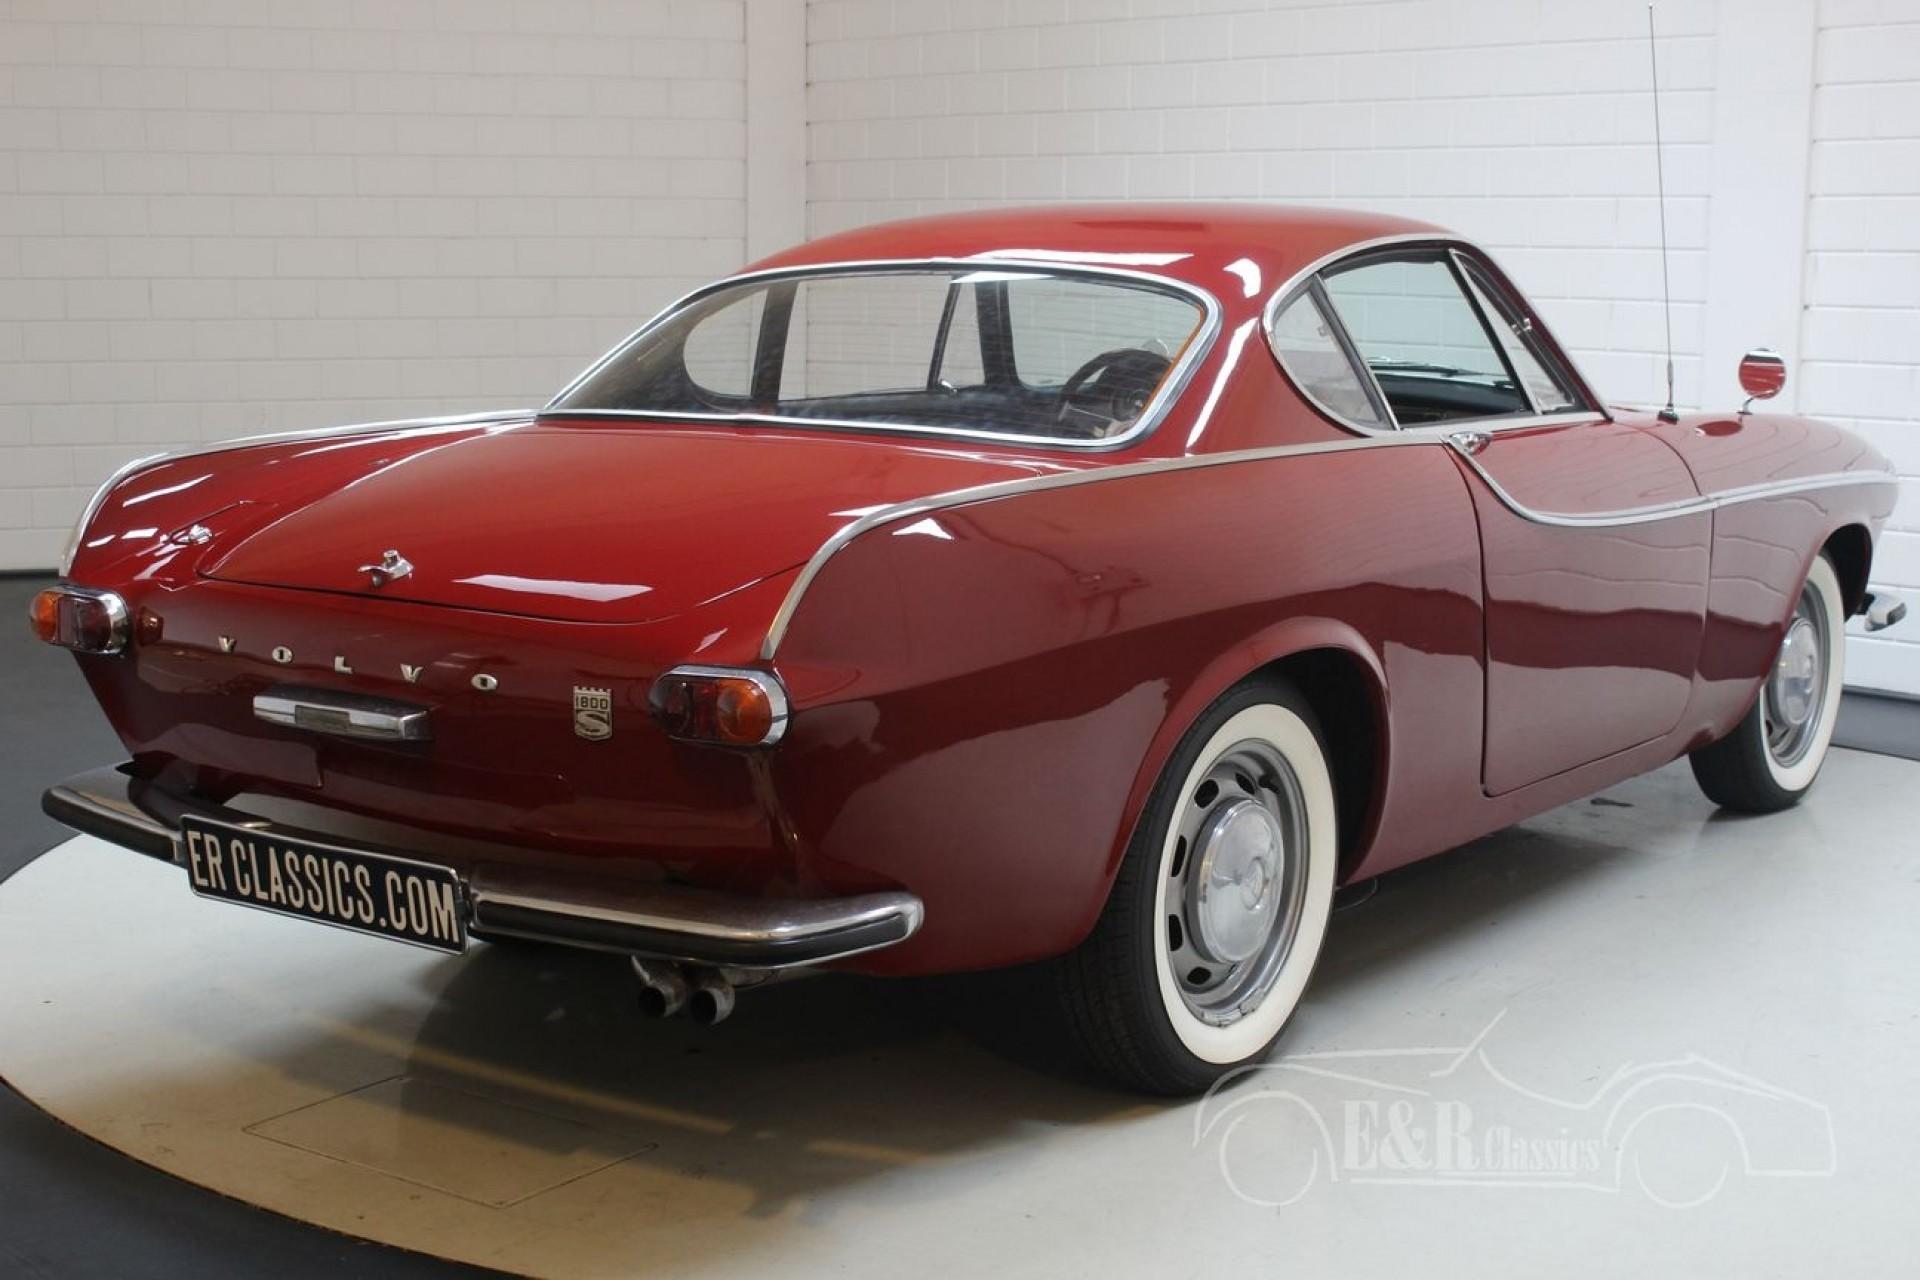 Volvo P1800 For Sale >> Volvo P1800 1965 for sale at ERclassics